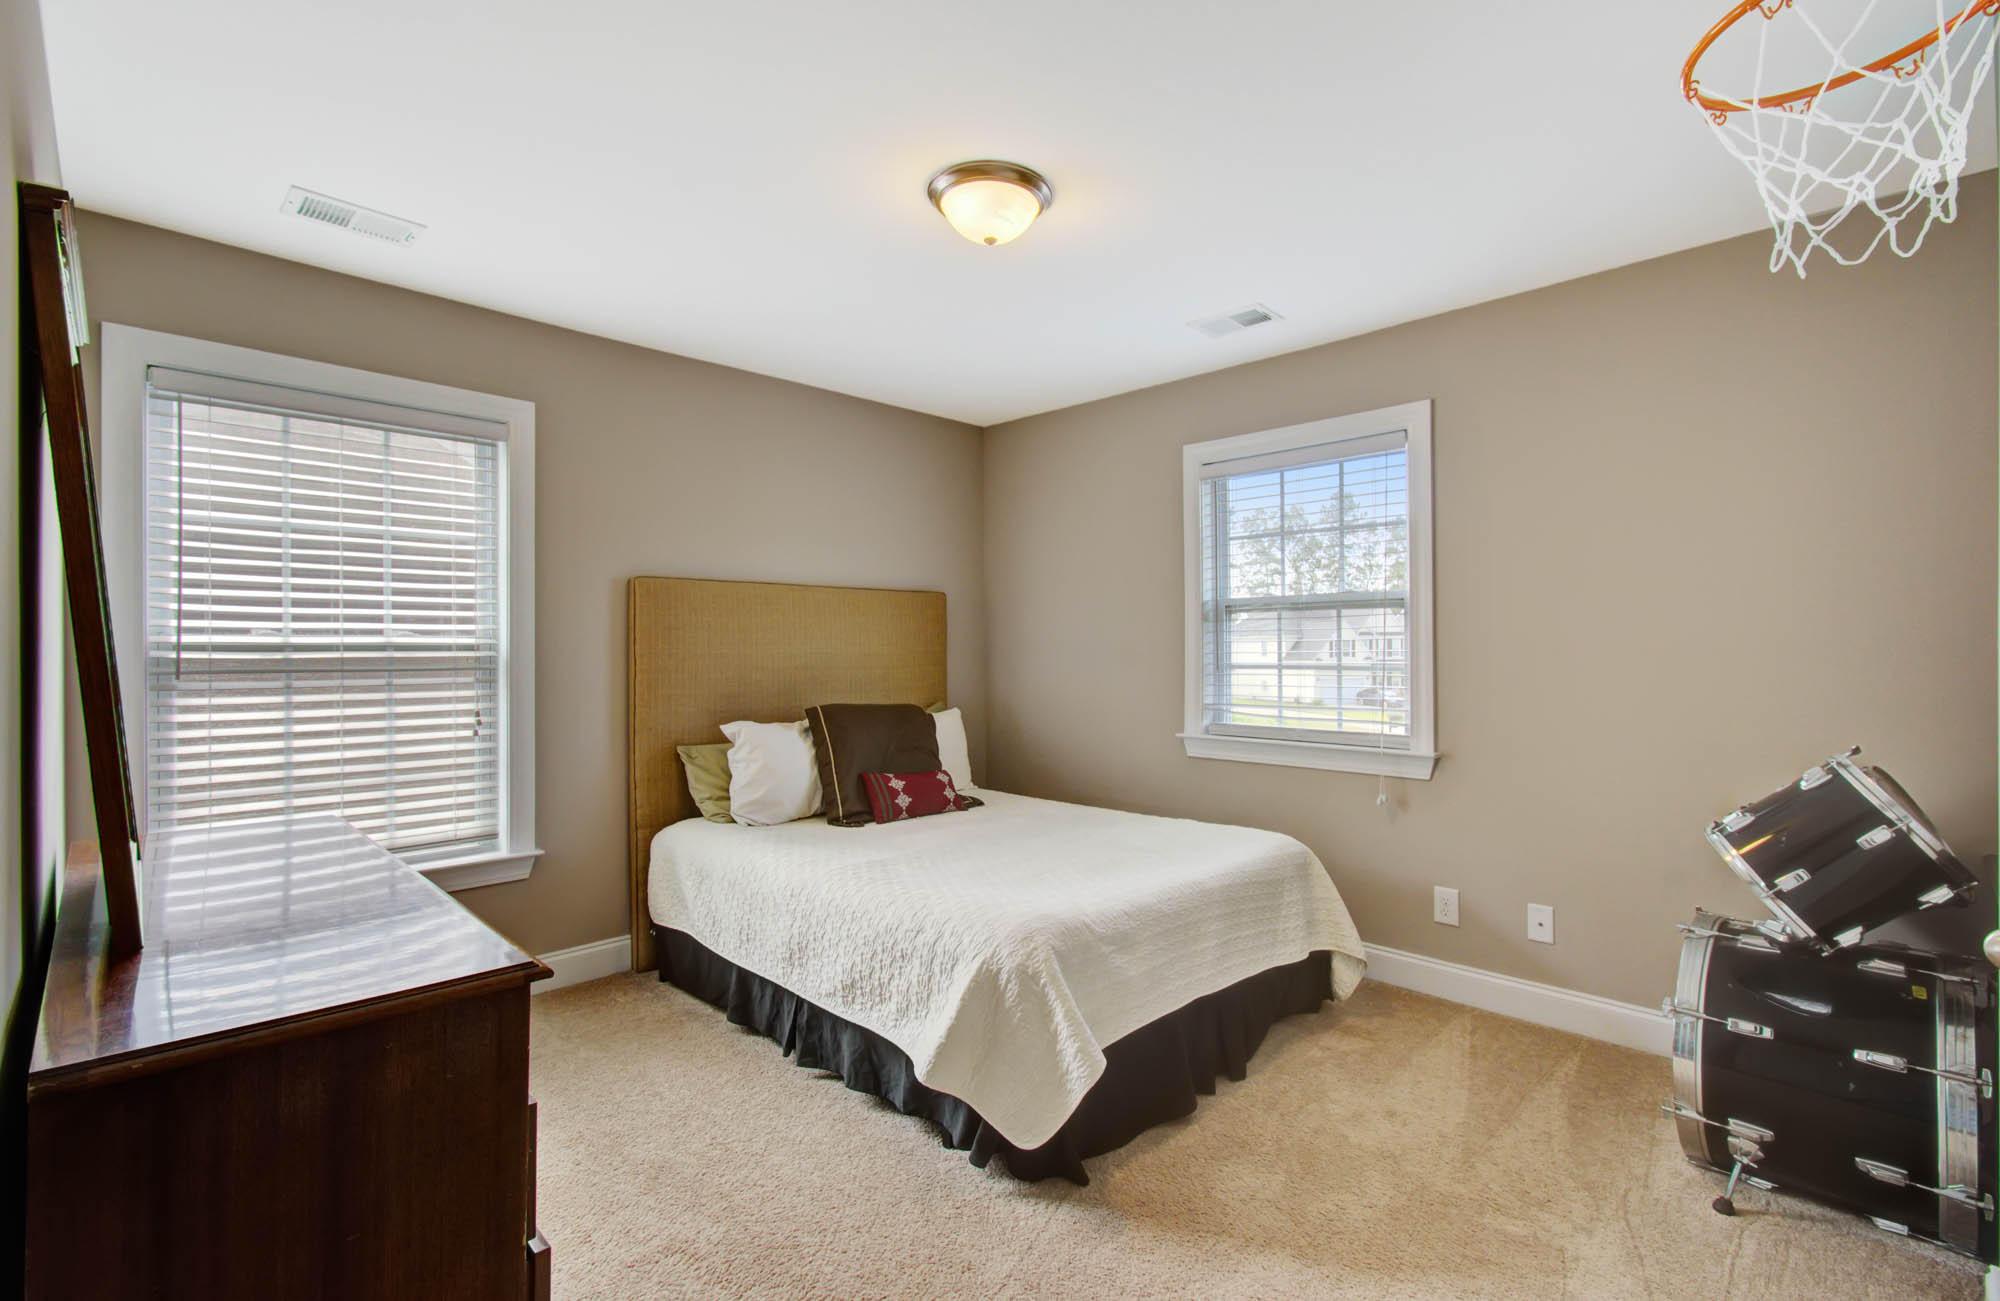 Indigo Palms Homes For Sale - 8535 Majestic, North Charleston, SC - 7